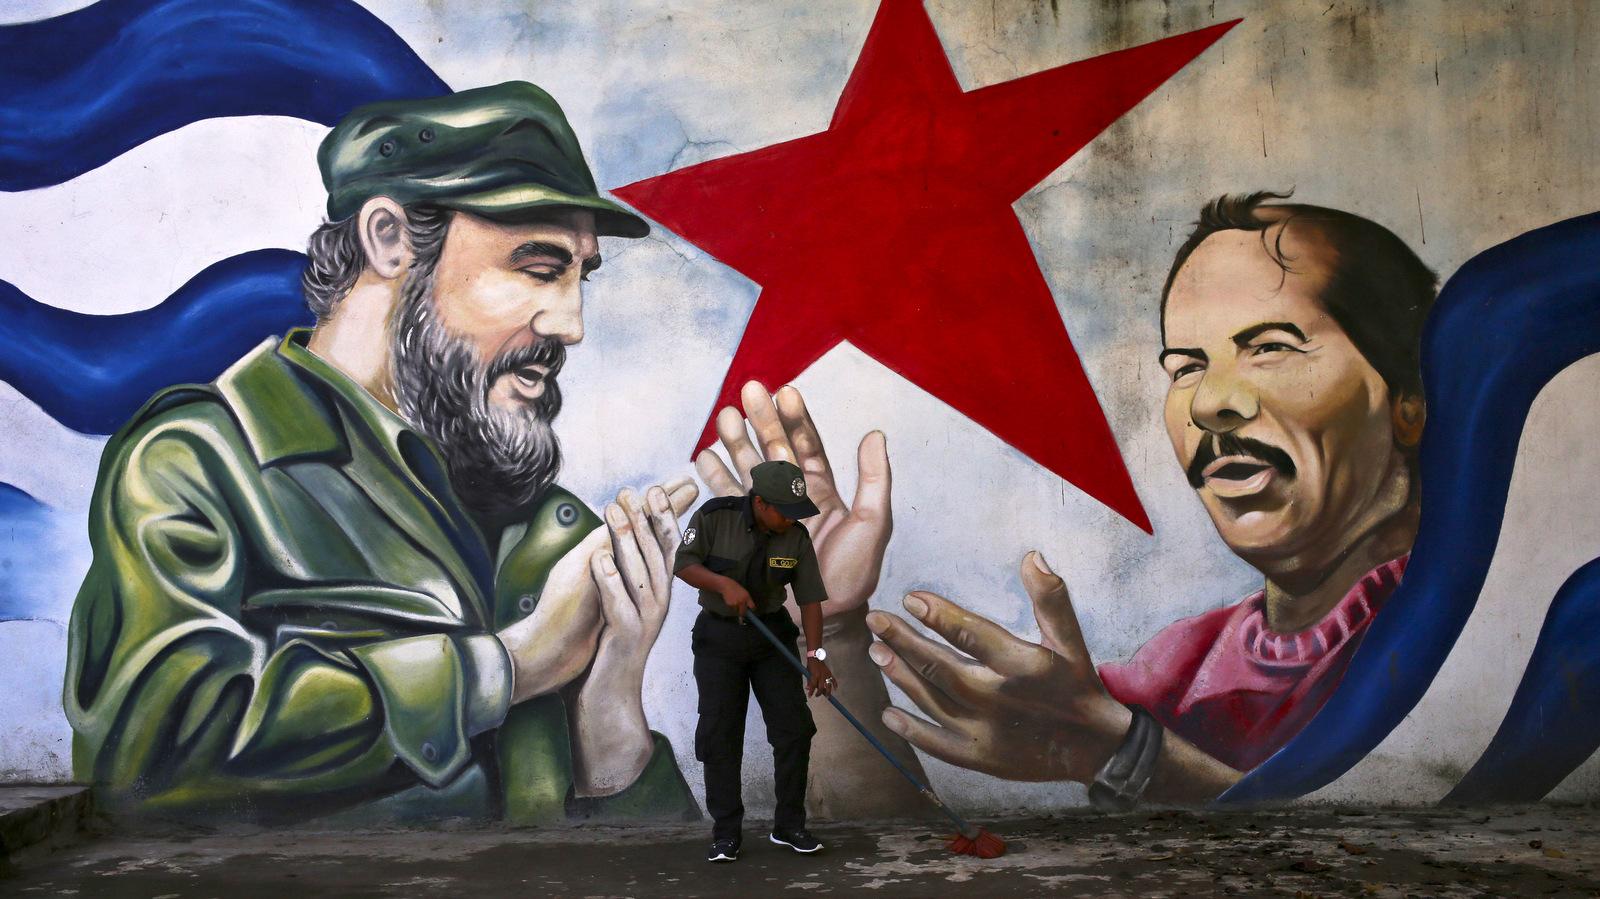 A woman sweeps the Cuba Plaza backdropped by a mural depicting Cuba's former President Fidel Castro and Nicaragua's President Daniel Ortega, in Managua, Nicaragua, Friday, Nov. 4, 2016. (AP Photo/Esteban Felix)